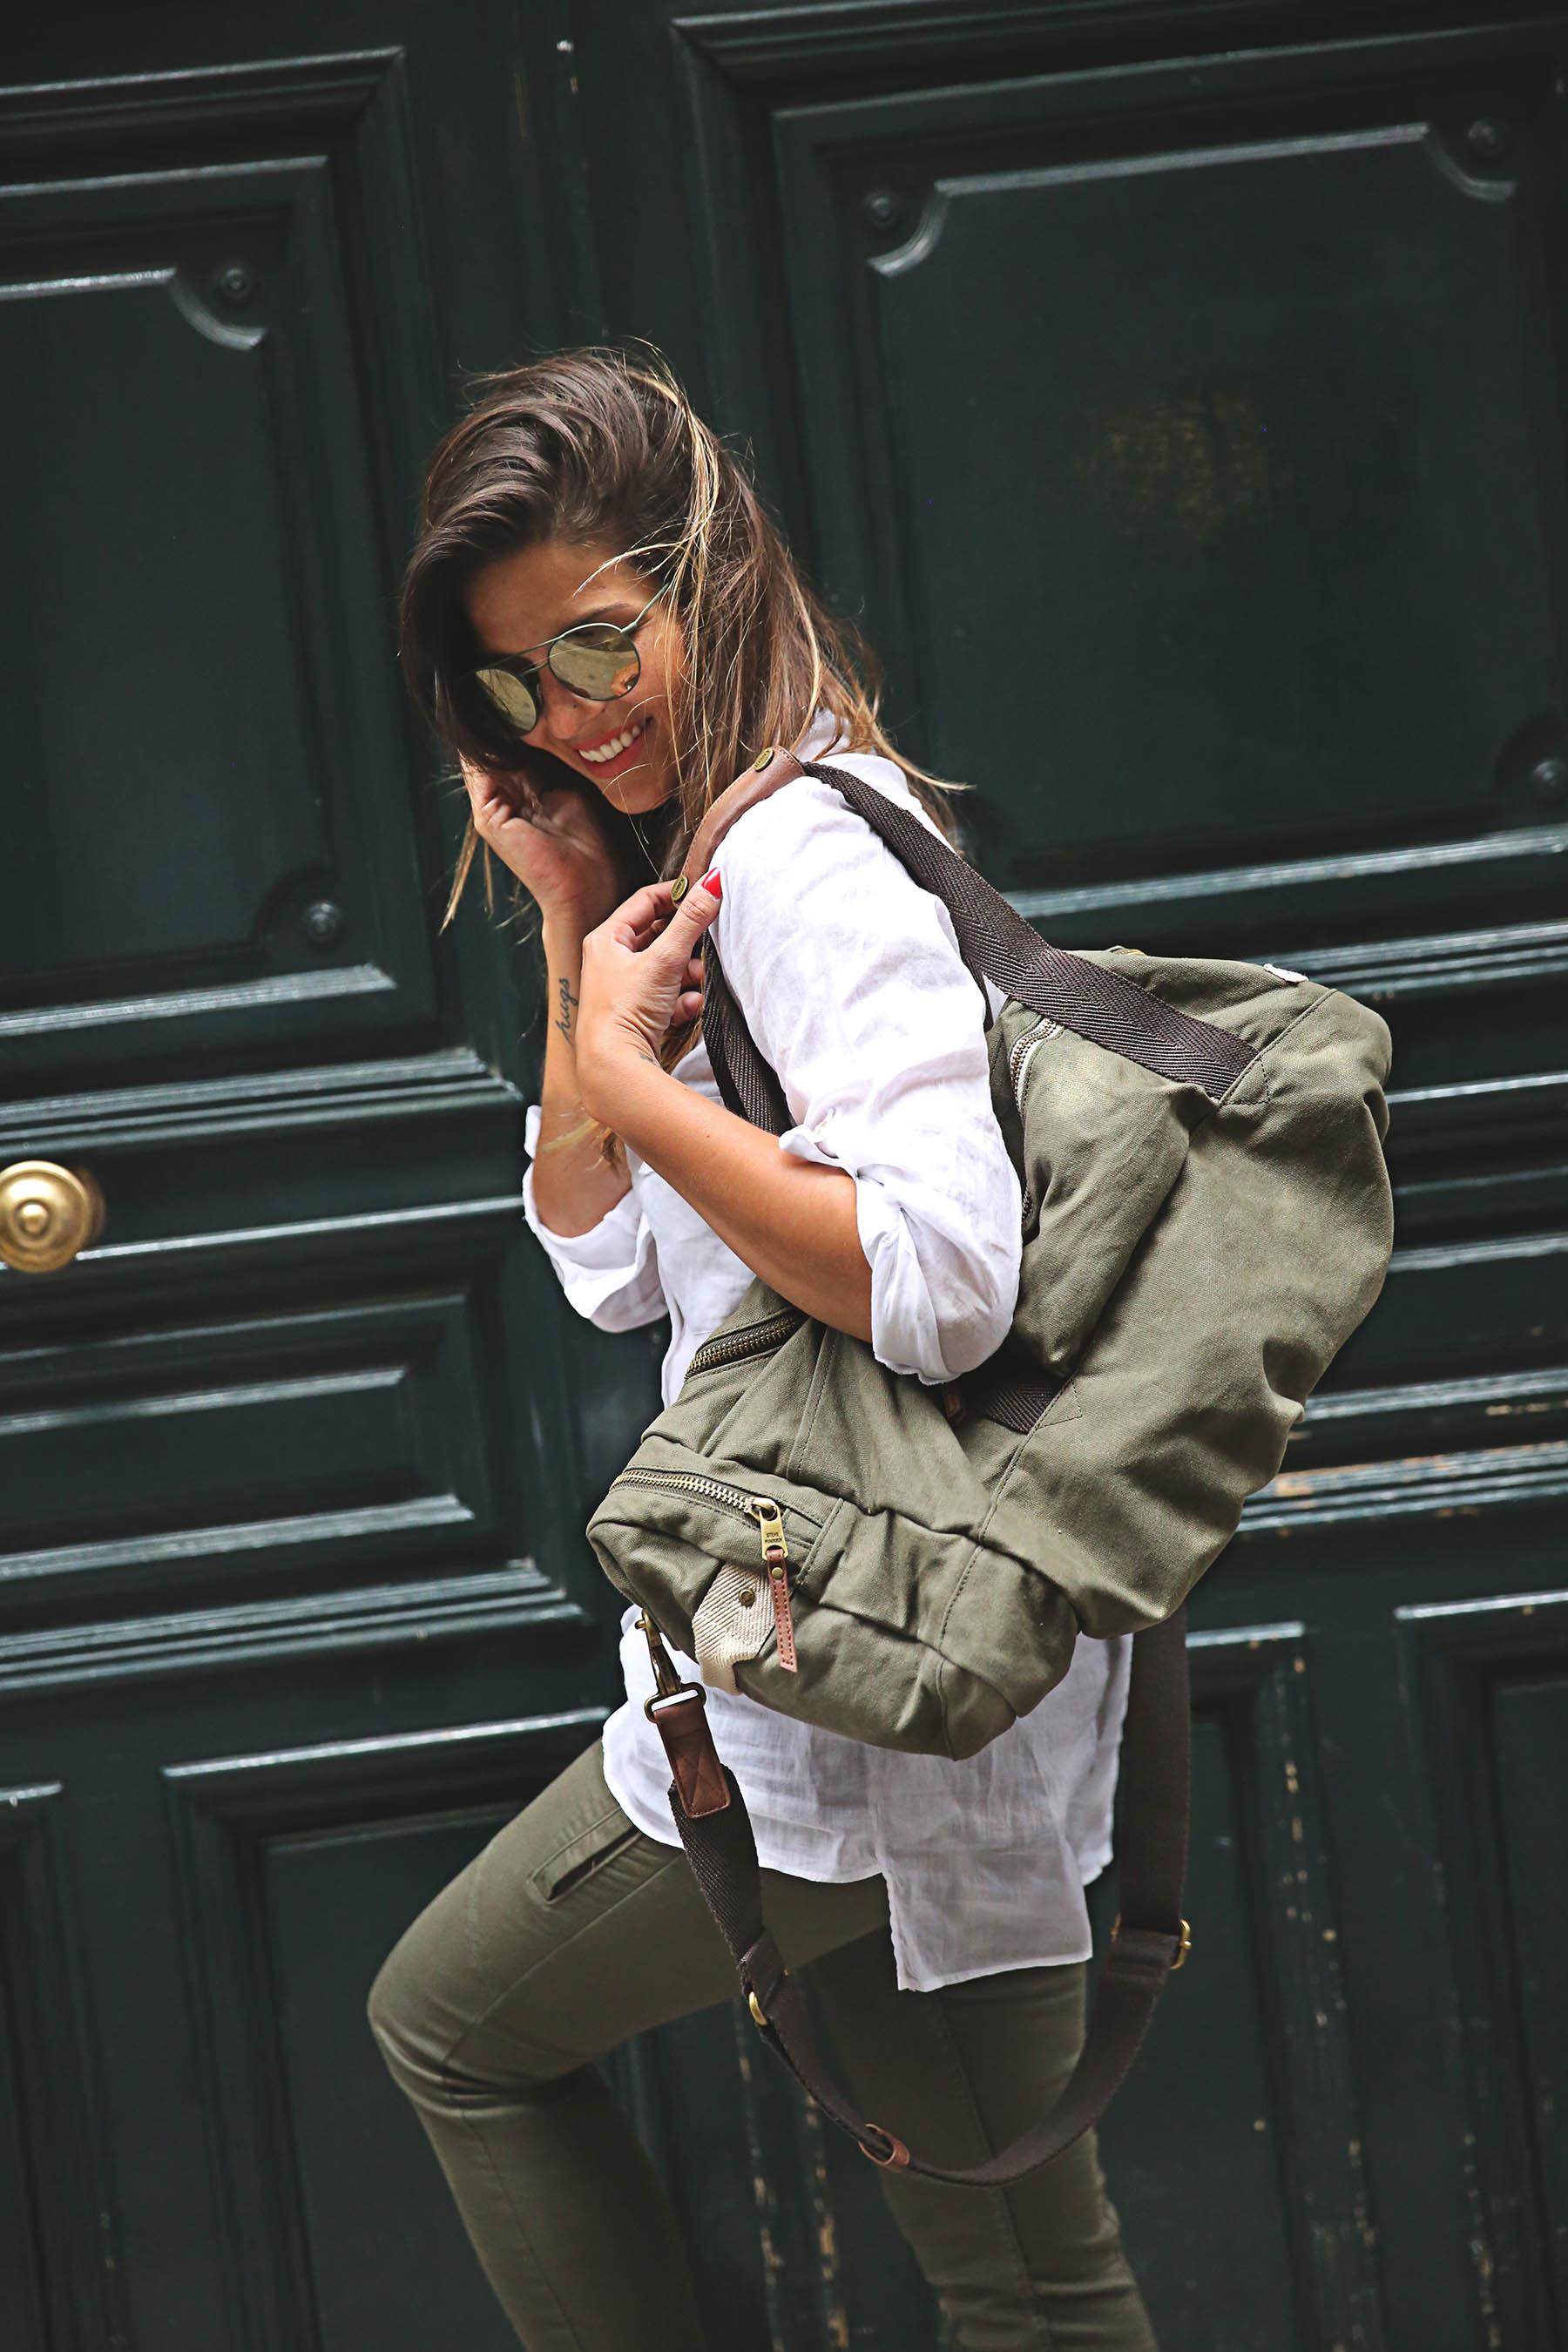 trendy-taste-look-outfit-street-style-steve-madden-ootd-blog-blogger-fashion-spain-moda-españa-safari-traveling-viaje-bolsa-bag-khaki-caqui-pants-sandalias-zuecos-8